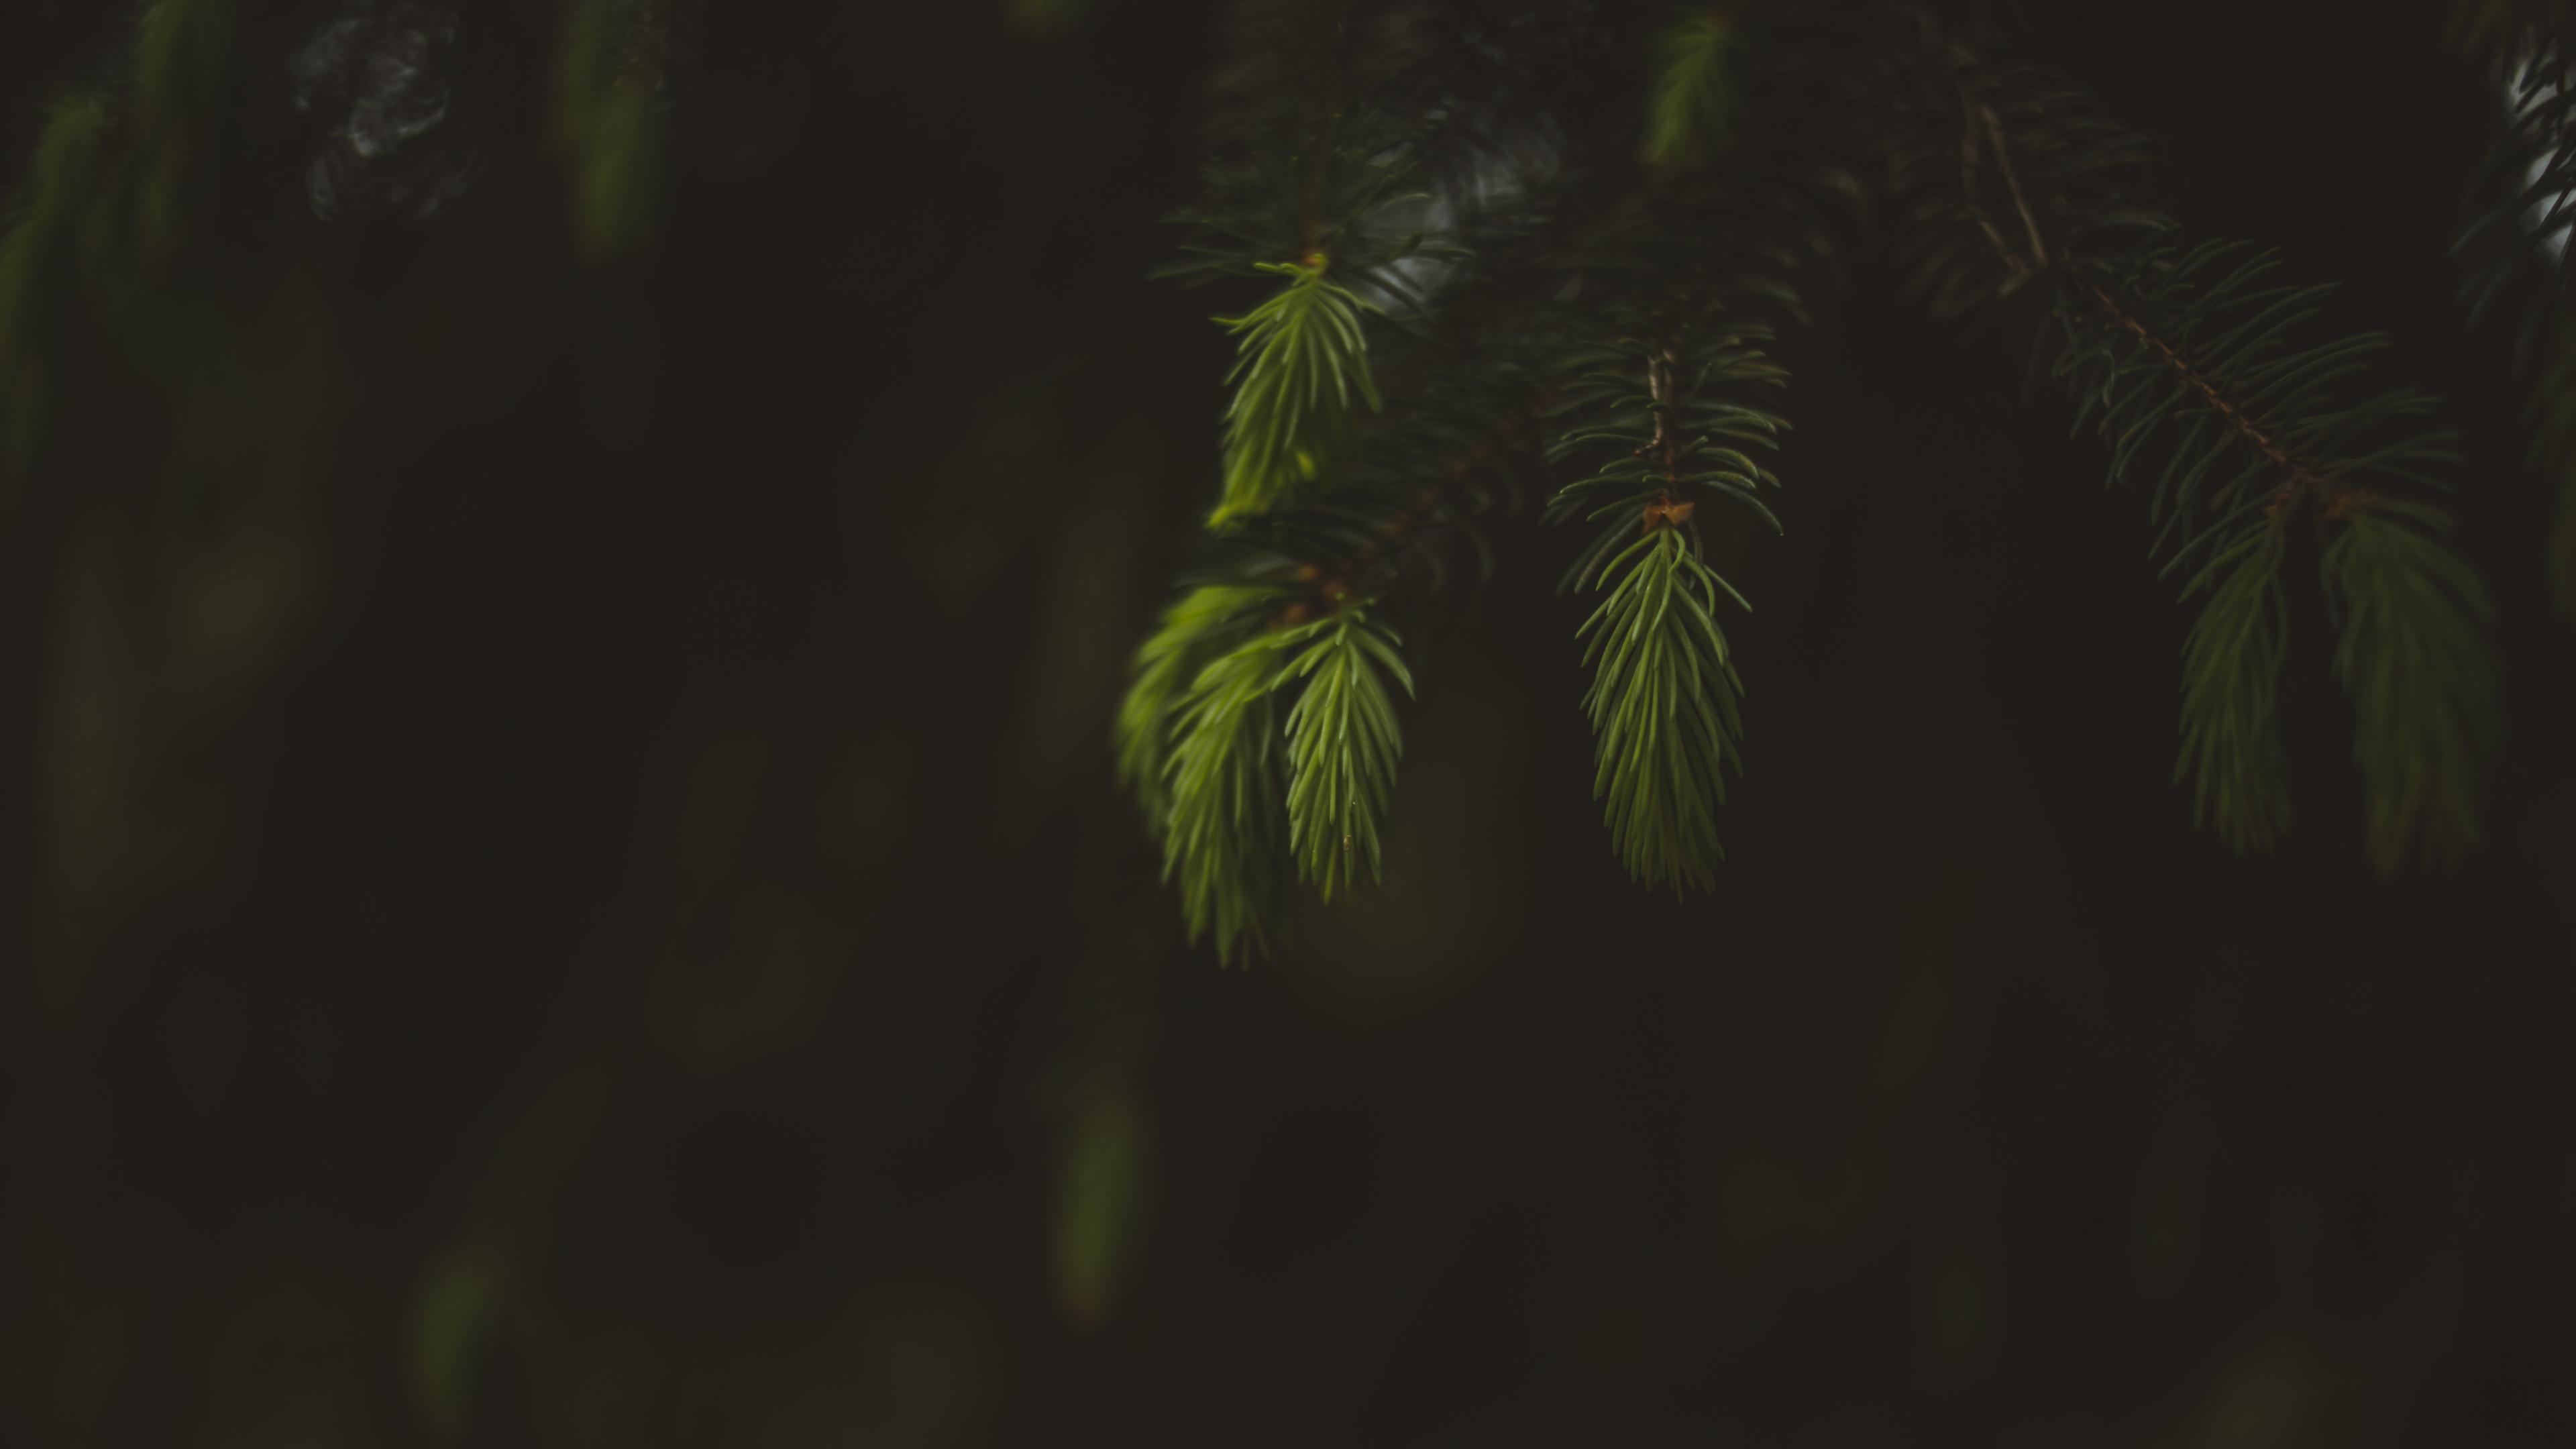 Blur, portrait, leaf, fern, 3840x2160 wallpaper